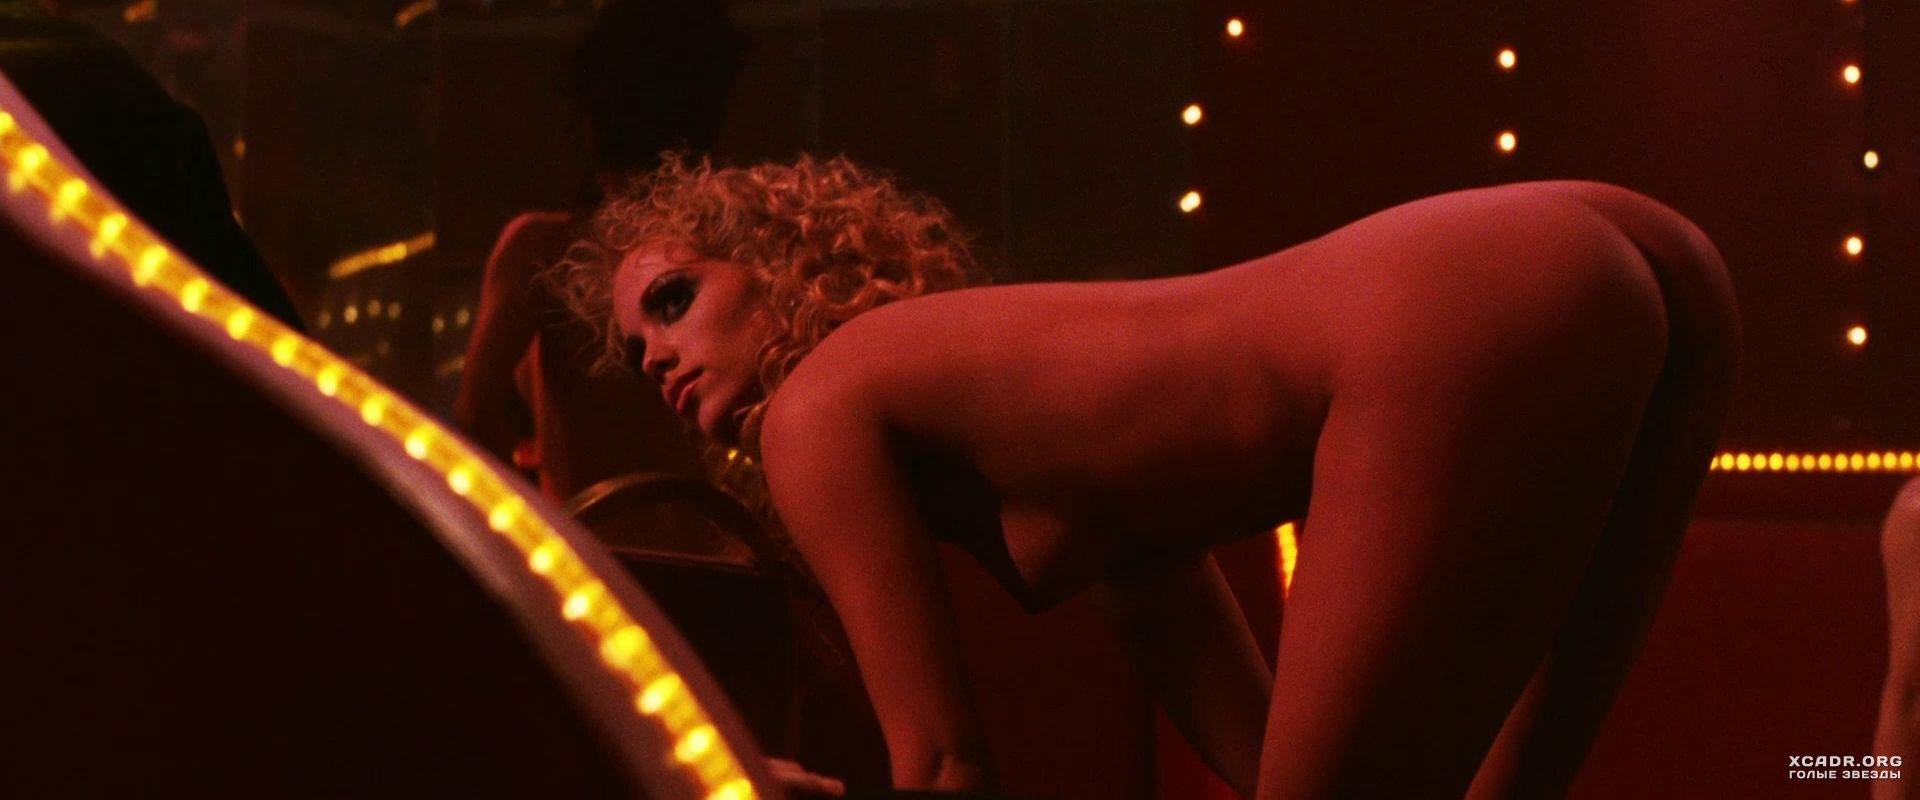 elizabeth-berkley-s-naked-free-pussy-fuck-gifs